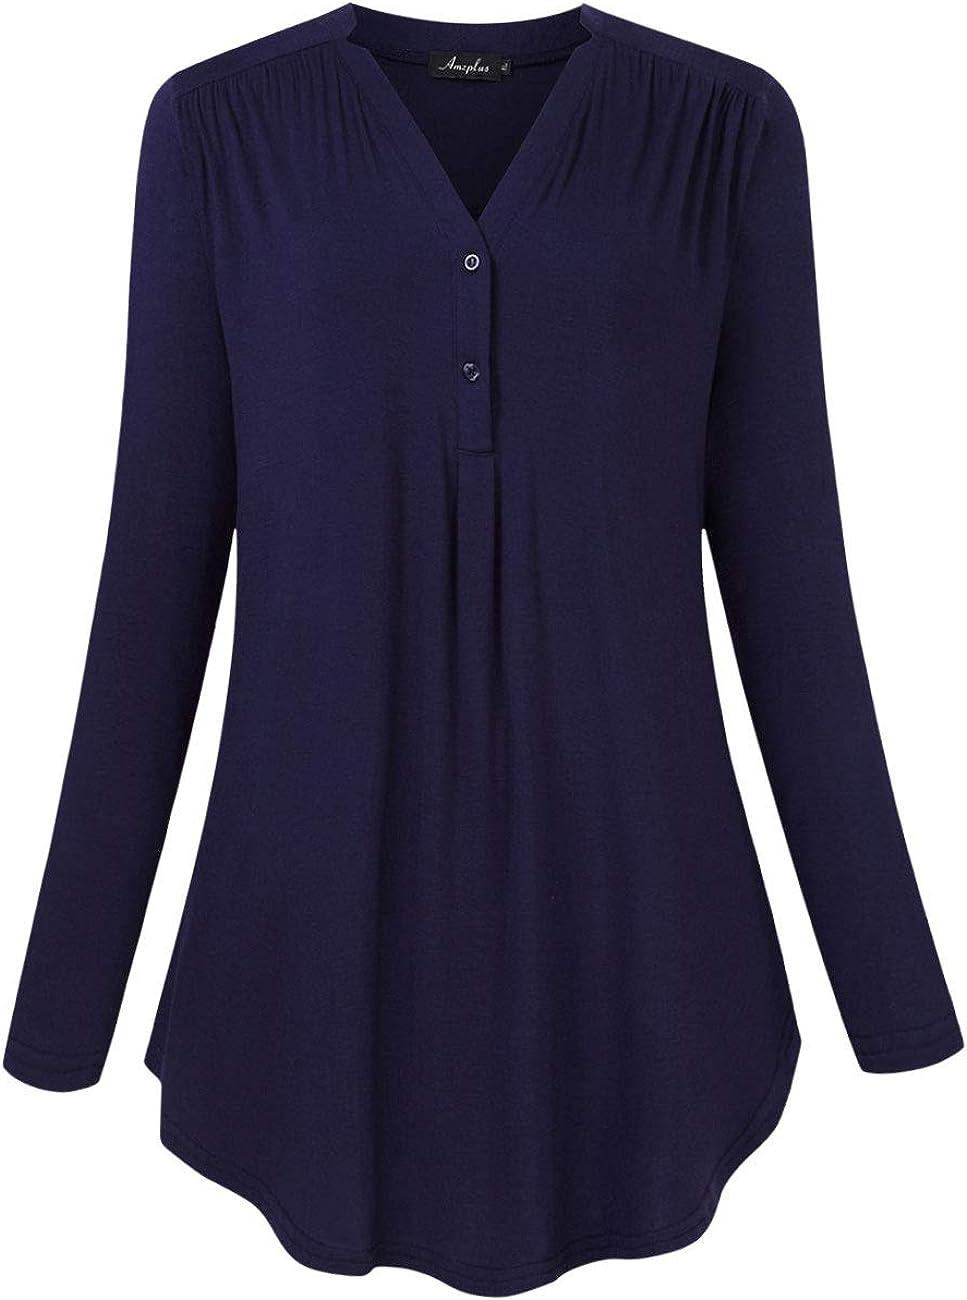 AMZ PLUS National uniform free shipping Women's Plus Size Loose Stretch Blouse Long Sleeve Time sale Henl